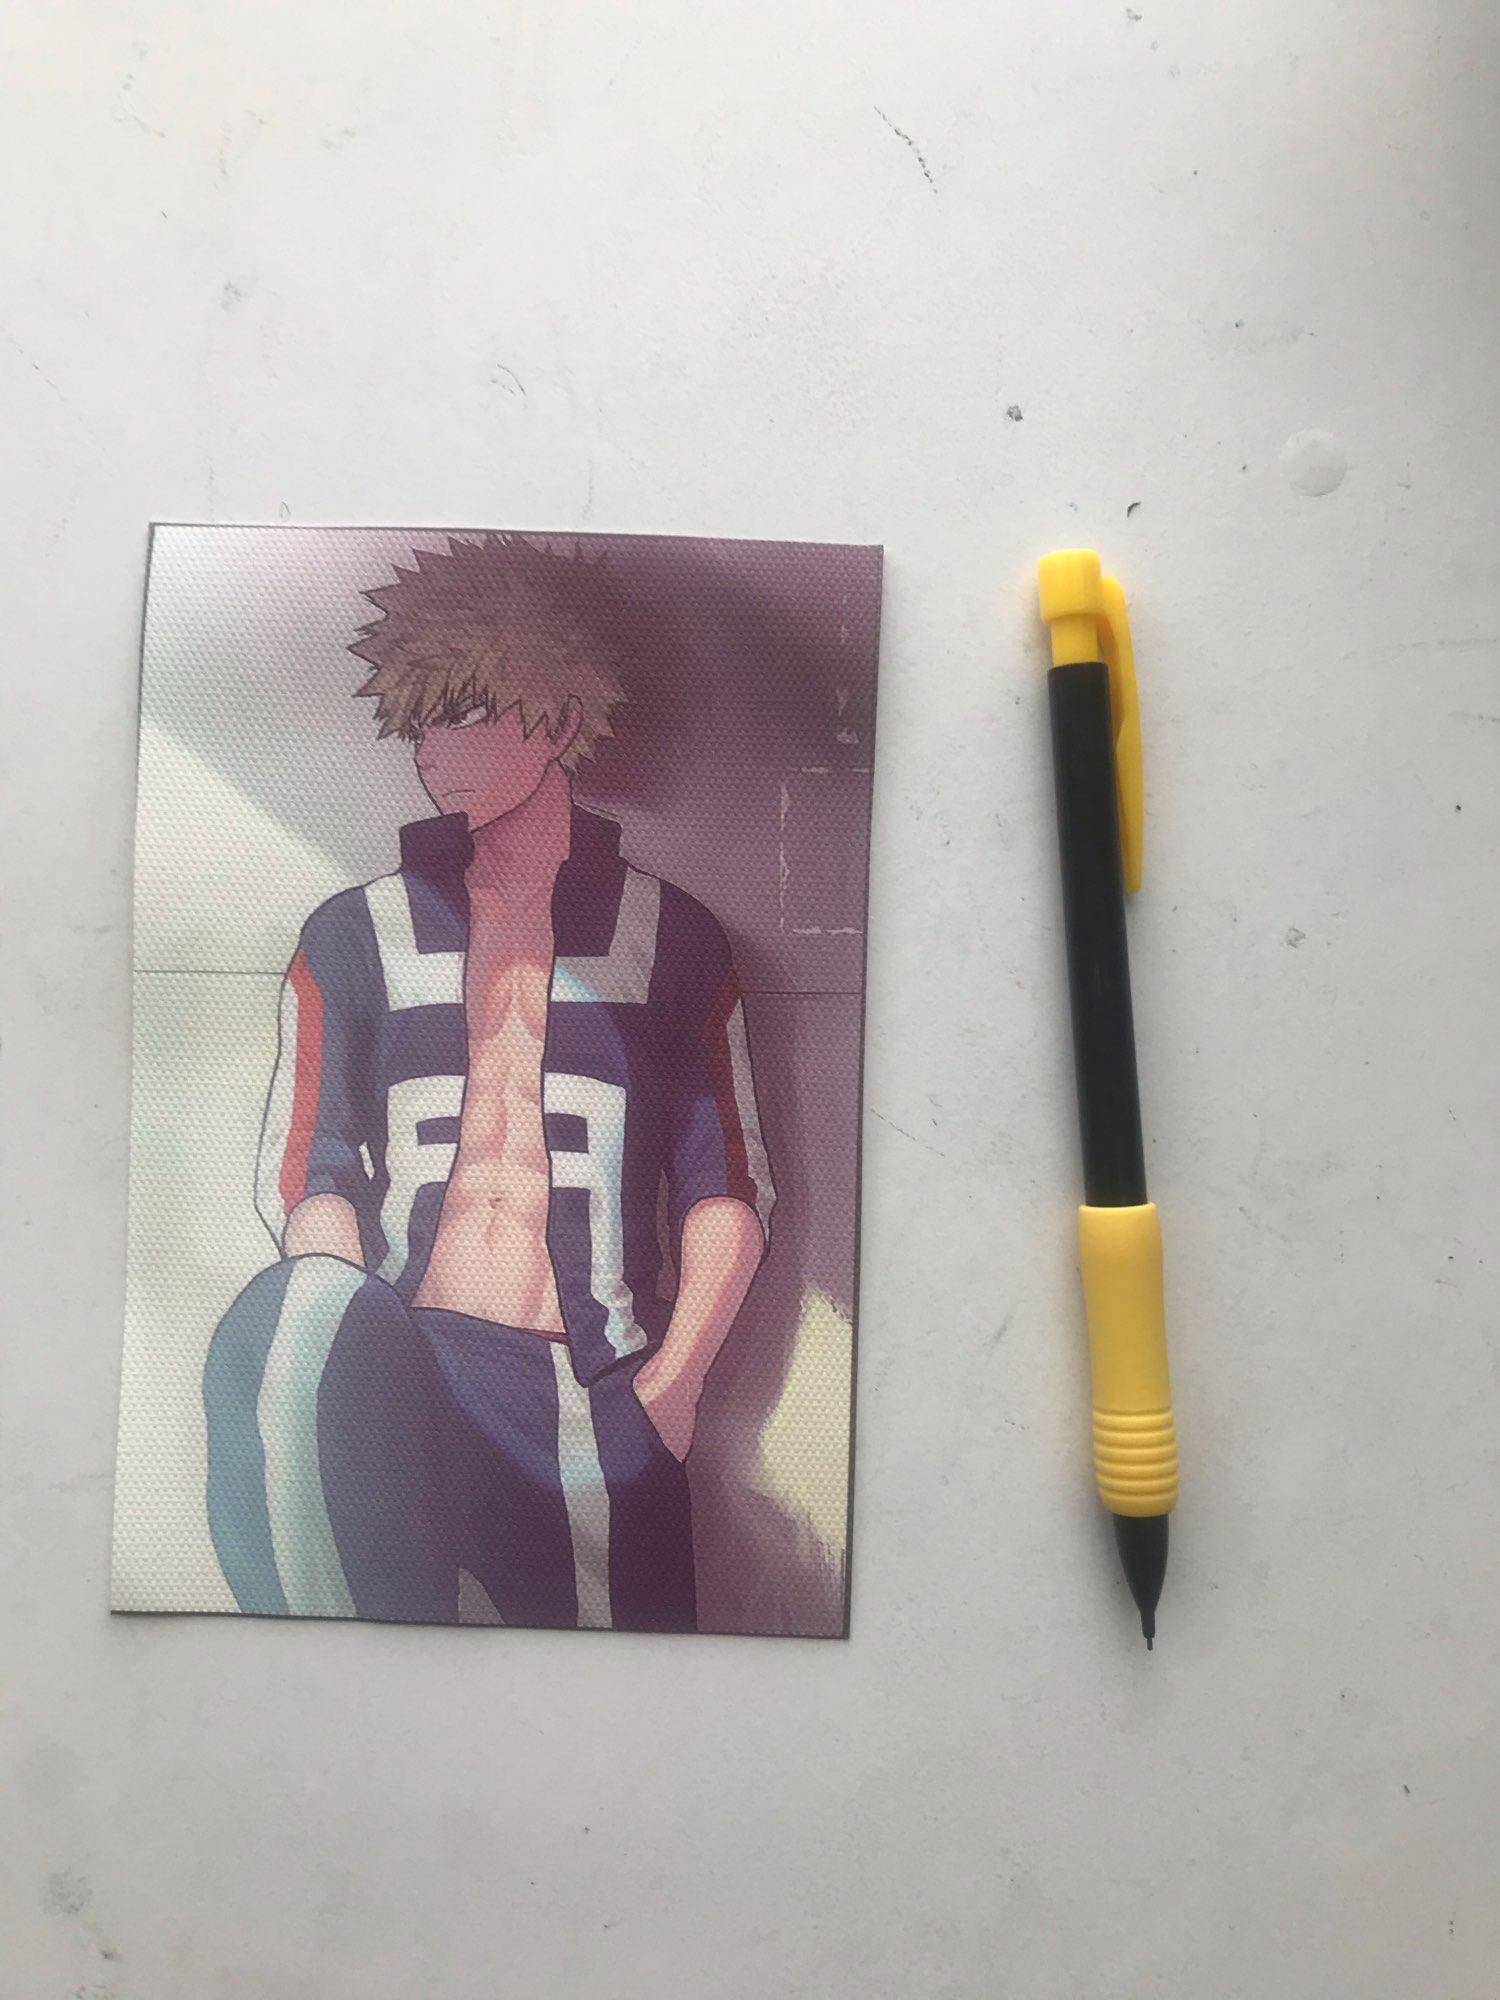 Canvas Painting Anime Posters My Hero Academia Bakugo Katsuki Shoto Todoroki Izuku Midoriya Picture Wall Art Home Decor photo review